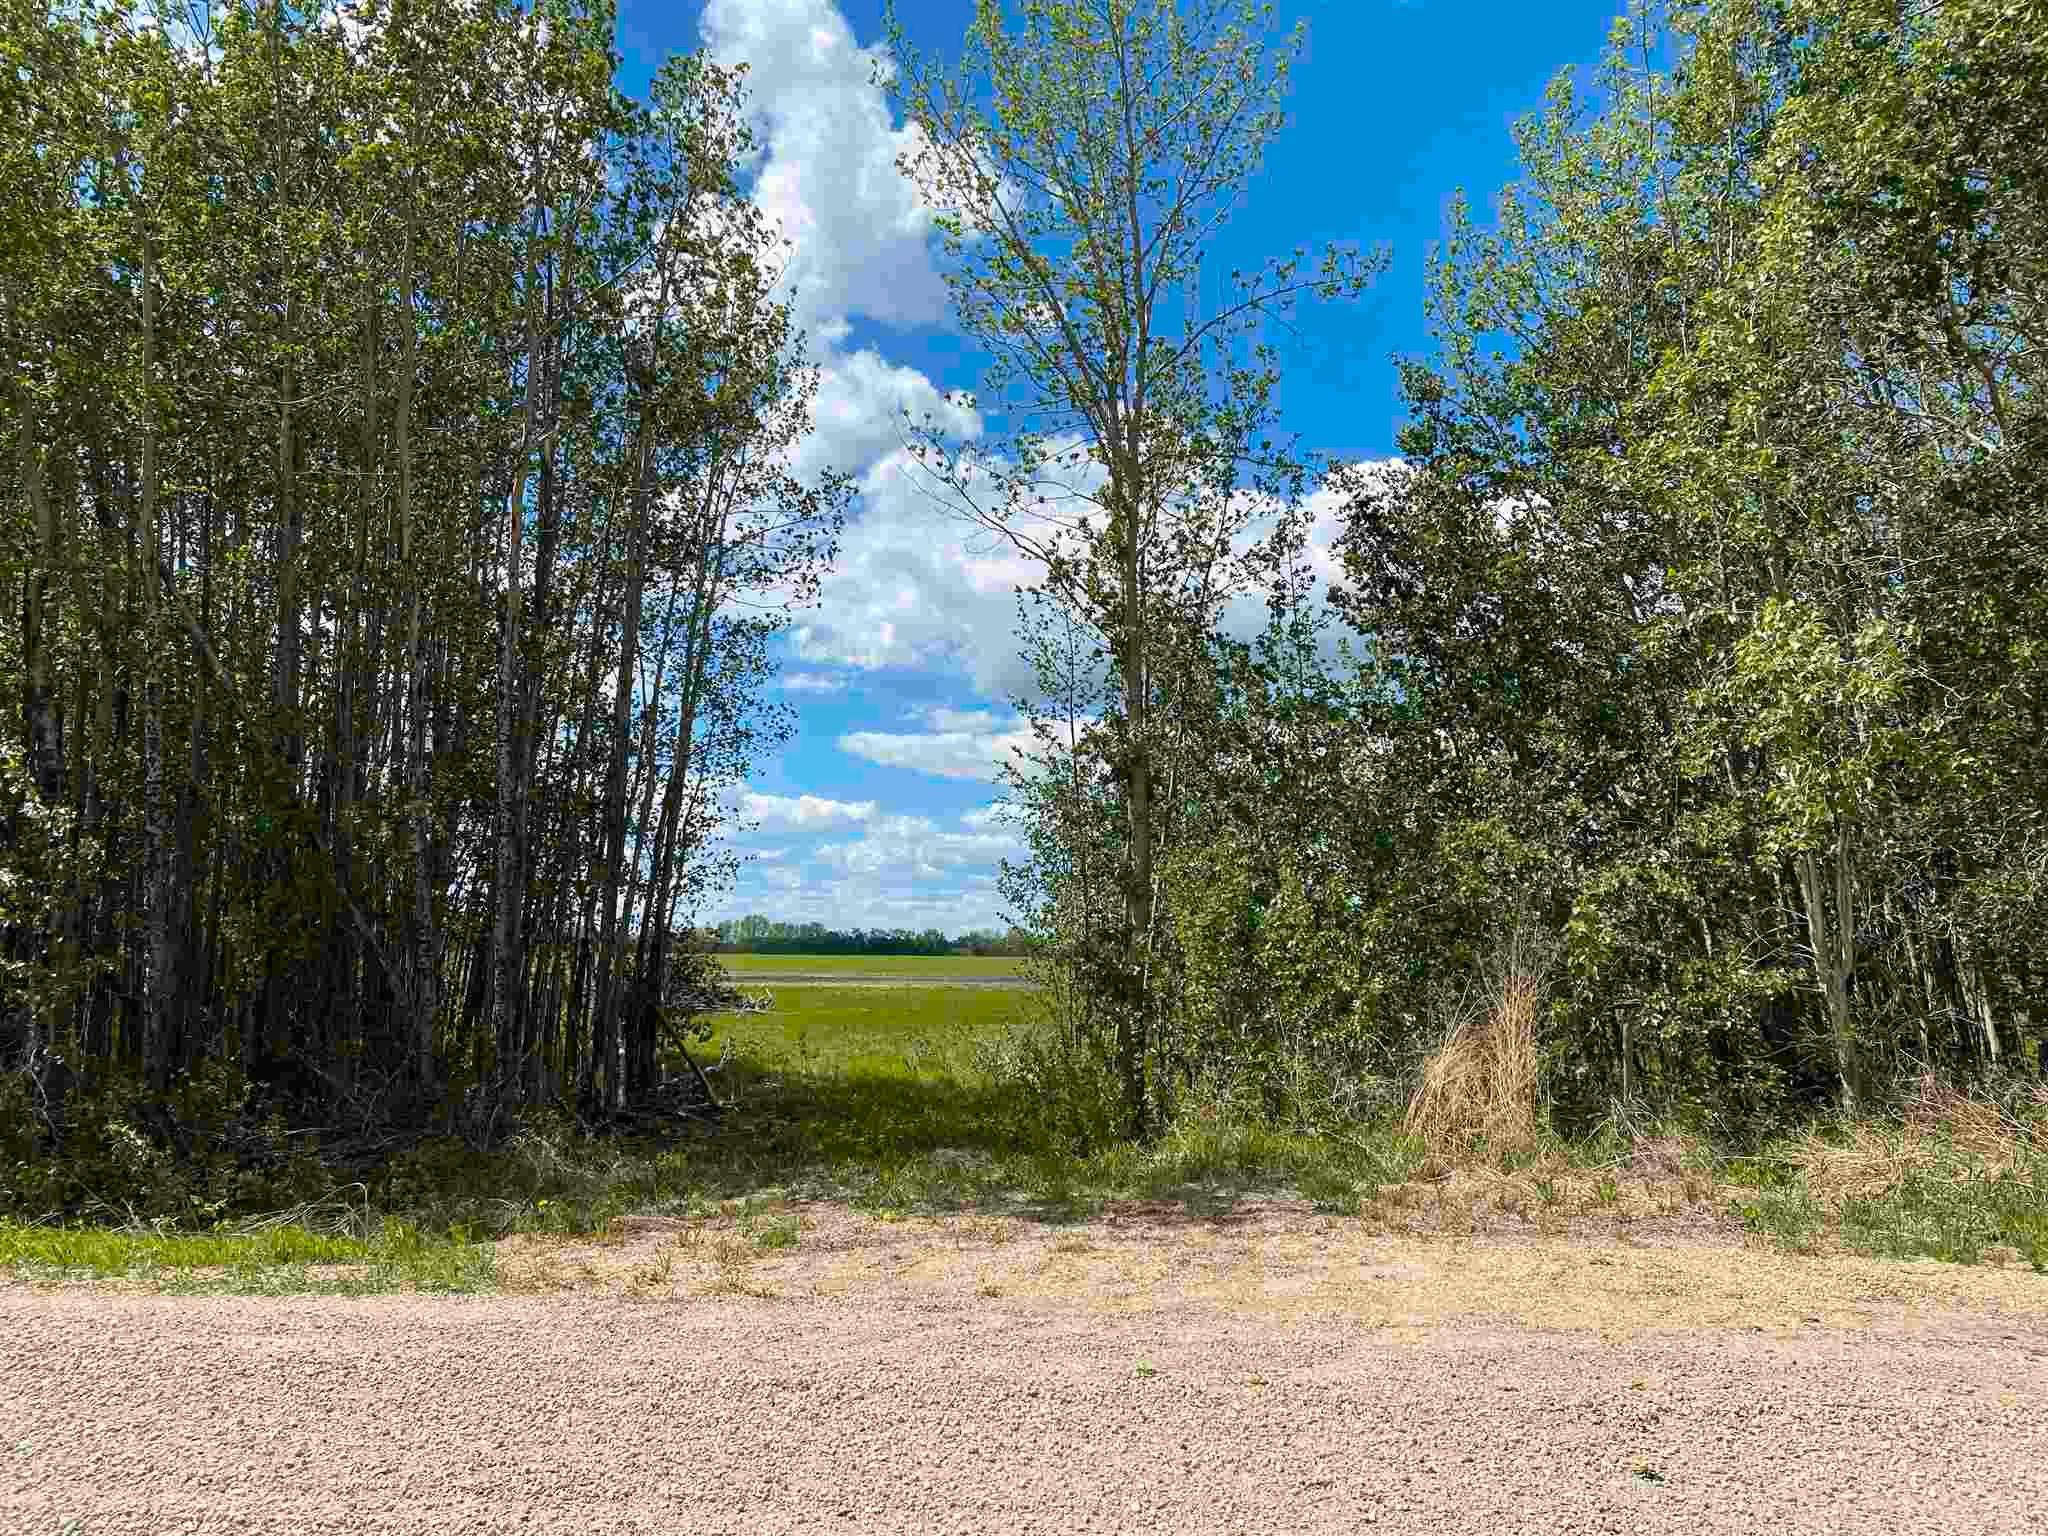 Main Photo: NE 34-49-27-W4 none: Rural Leduc County Rural Land/Vacant Lot for sale : MLS®# E4246771